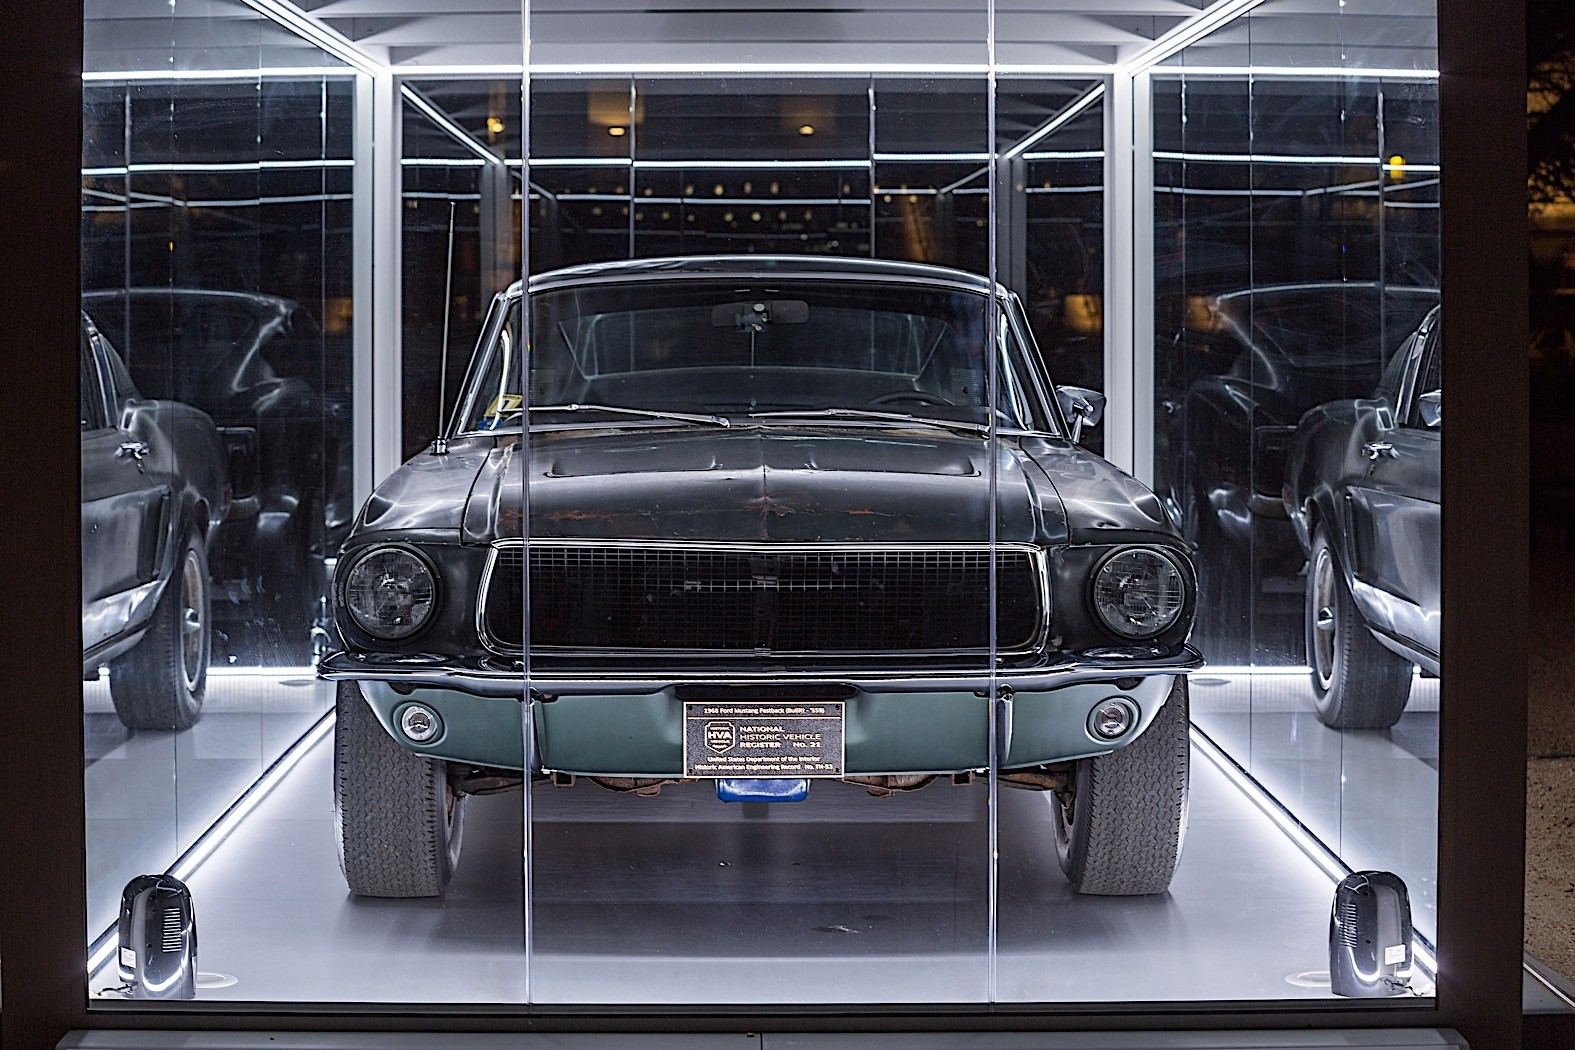 Original 1968 Bullitt Mustang to Be Shown in Washington ...